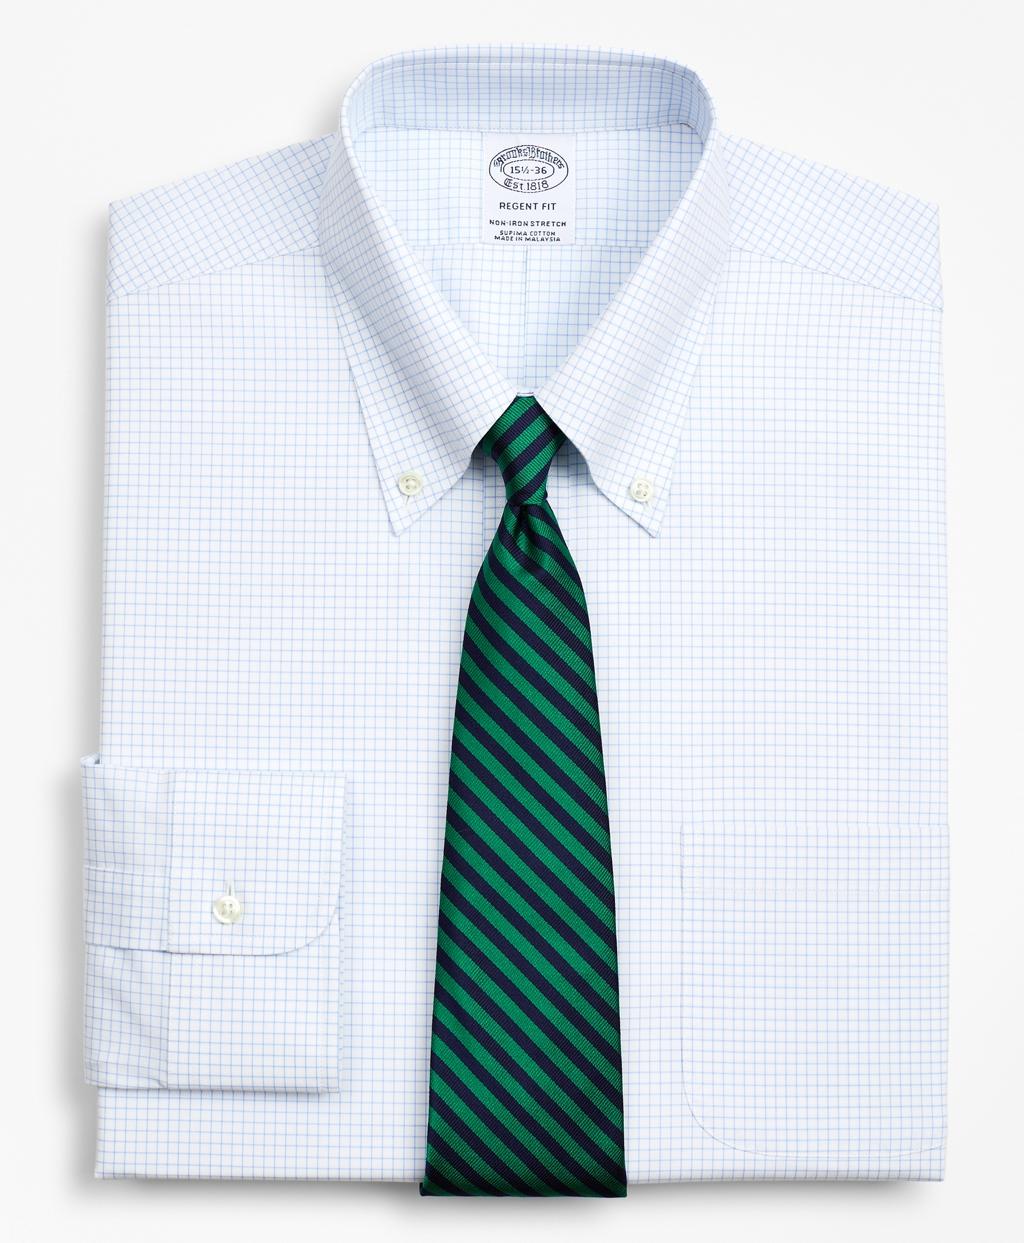 Brooksbrothers Stretch Regent Regular-Fit Dress Shirt, Non-Iron Poplin Button-Down Collar Small Grid Check